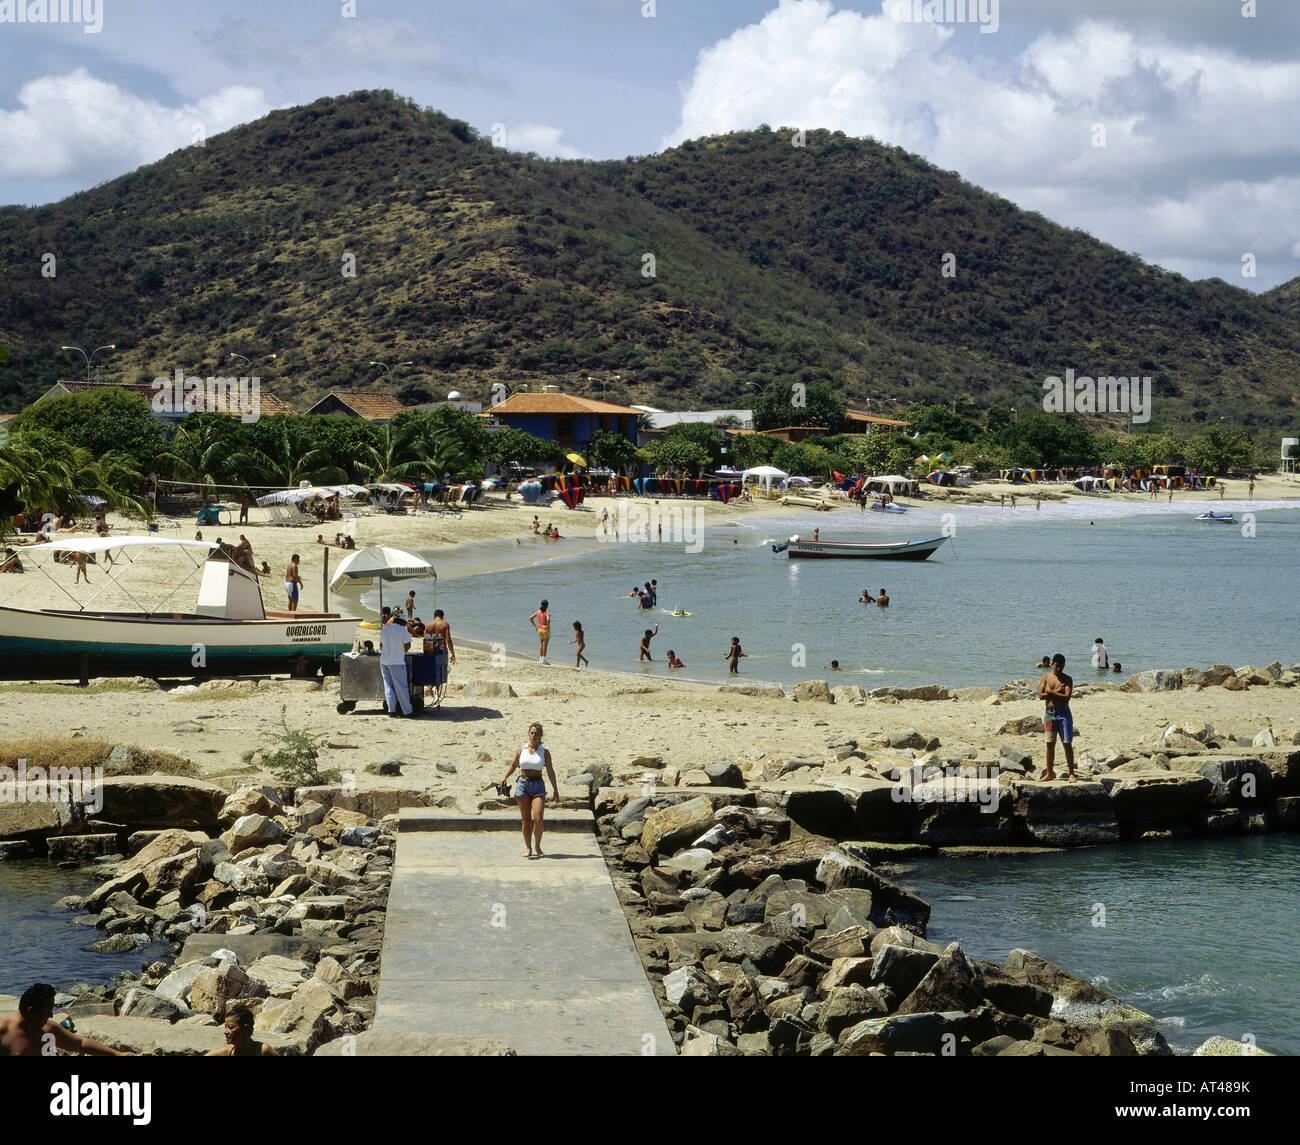 Berühmt geography / travel, Venezuela, Isla de Margarita, playa Pedro #EE_68